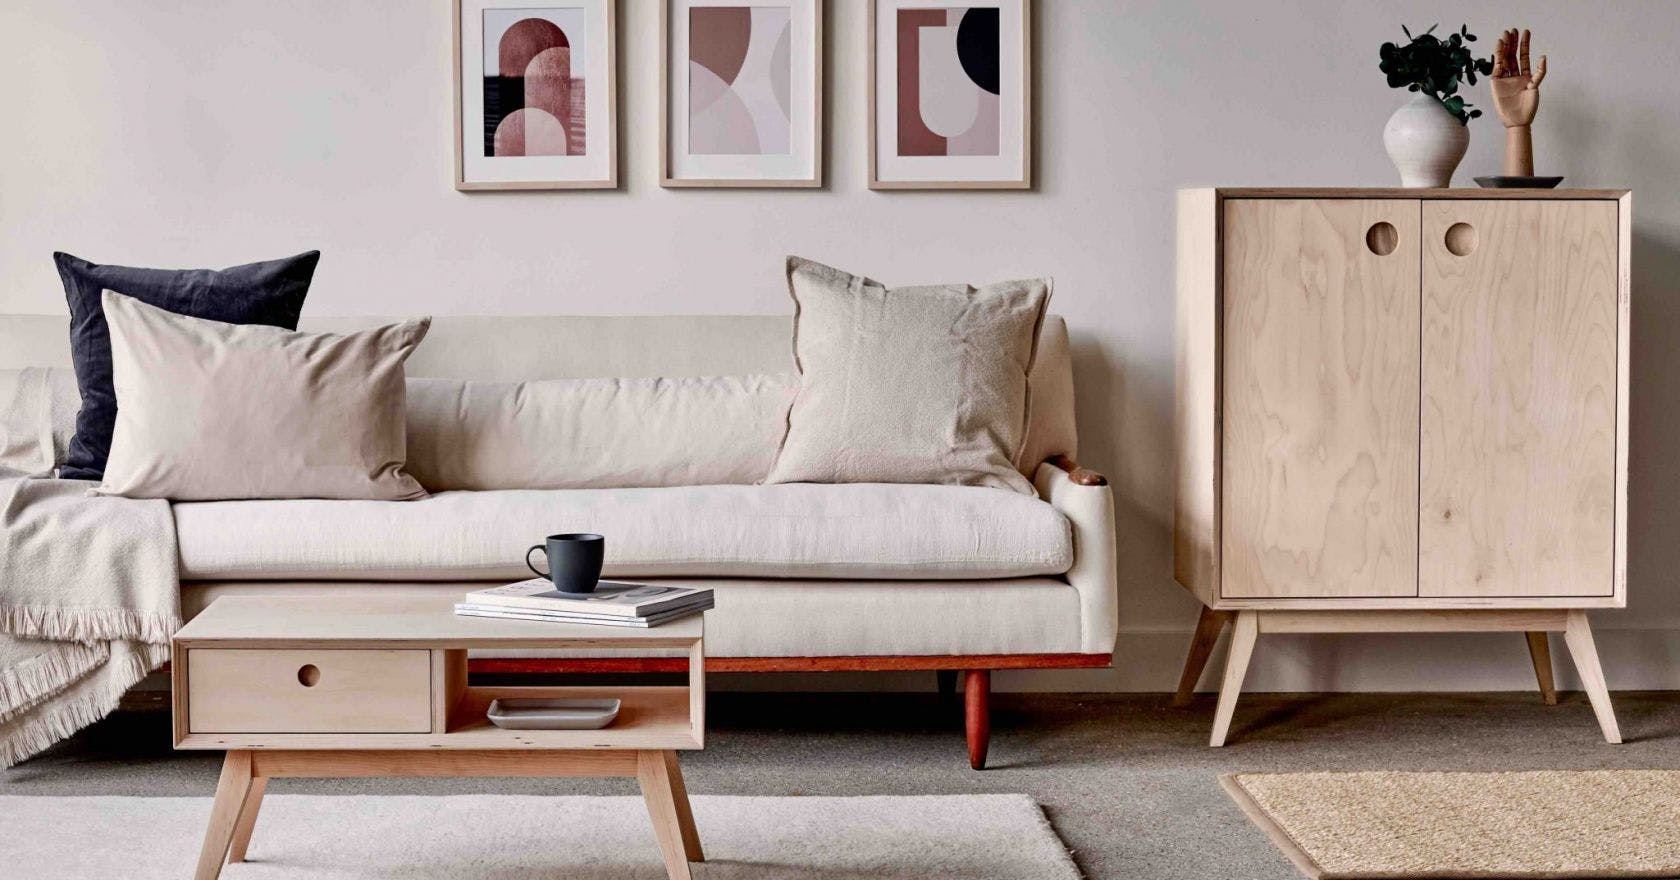 urbansize living room london ply range landscape low res 1680x880